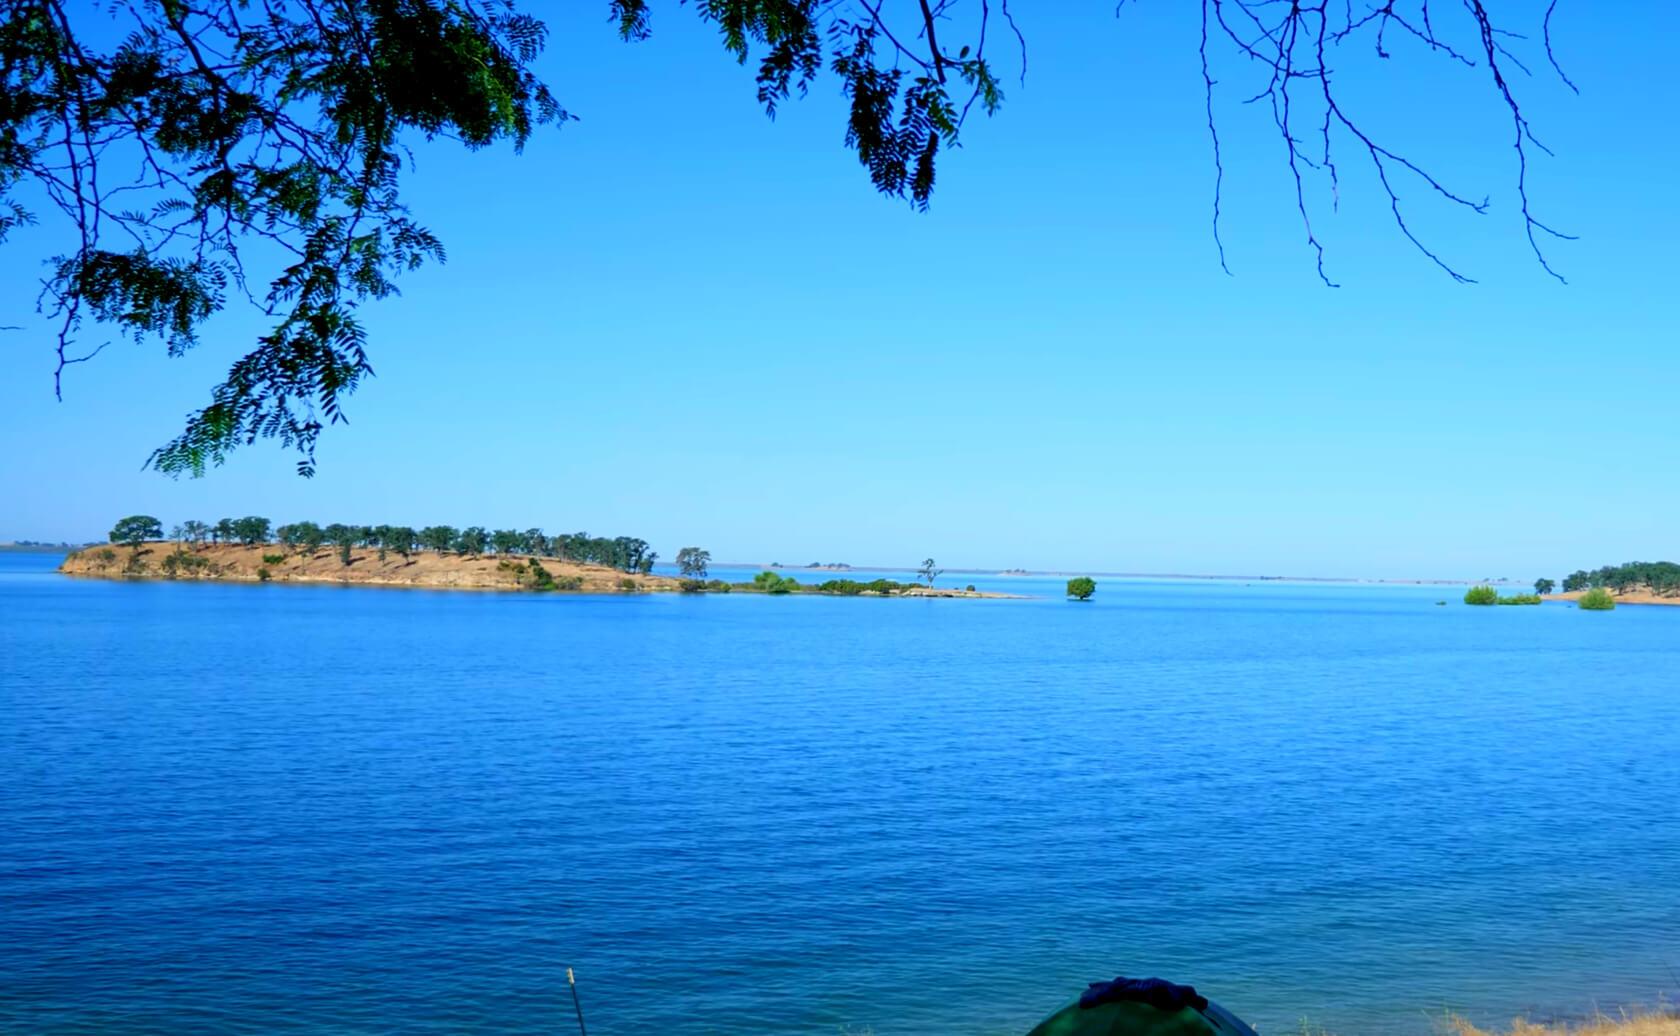 Camanche-Lake-Reservoir-Fishing-Guide-Report-California-06